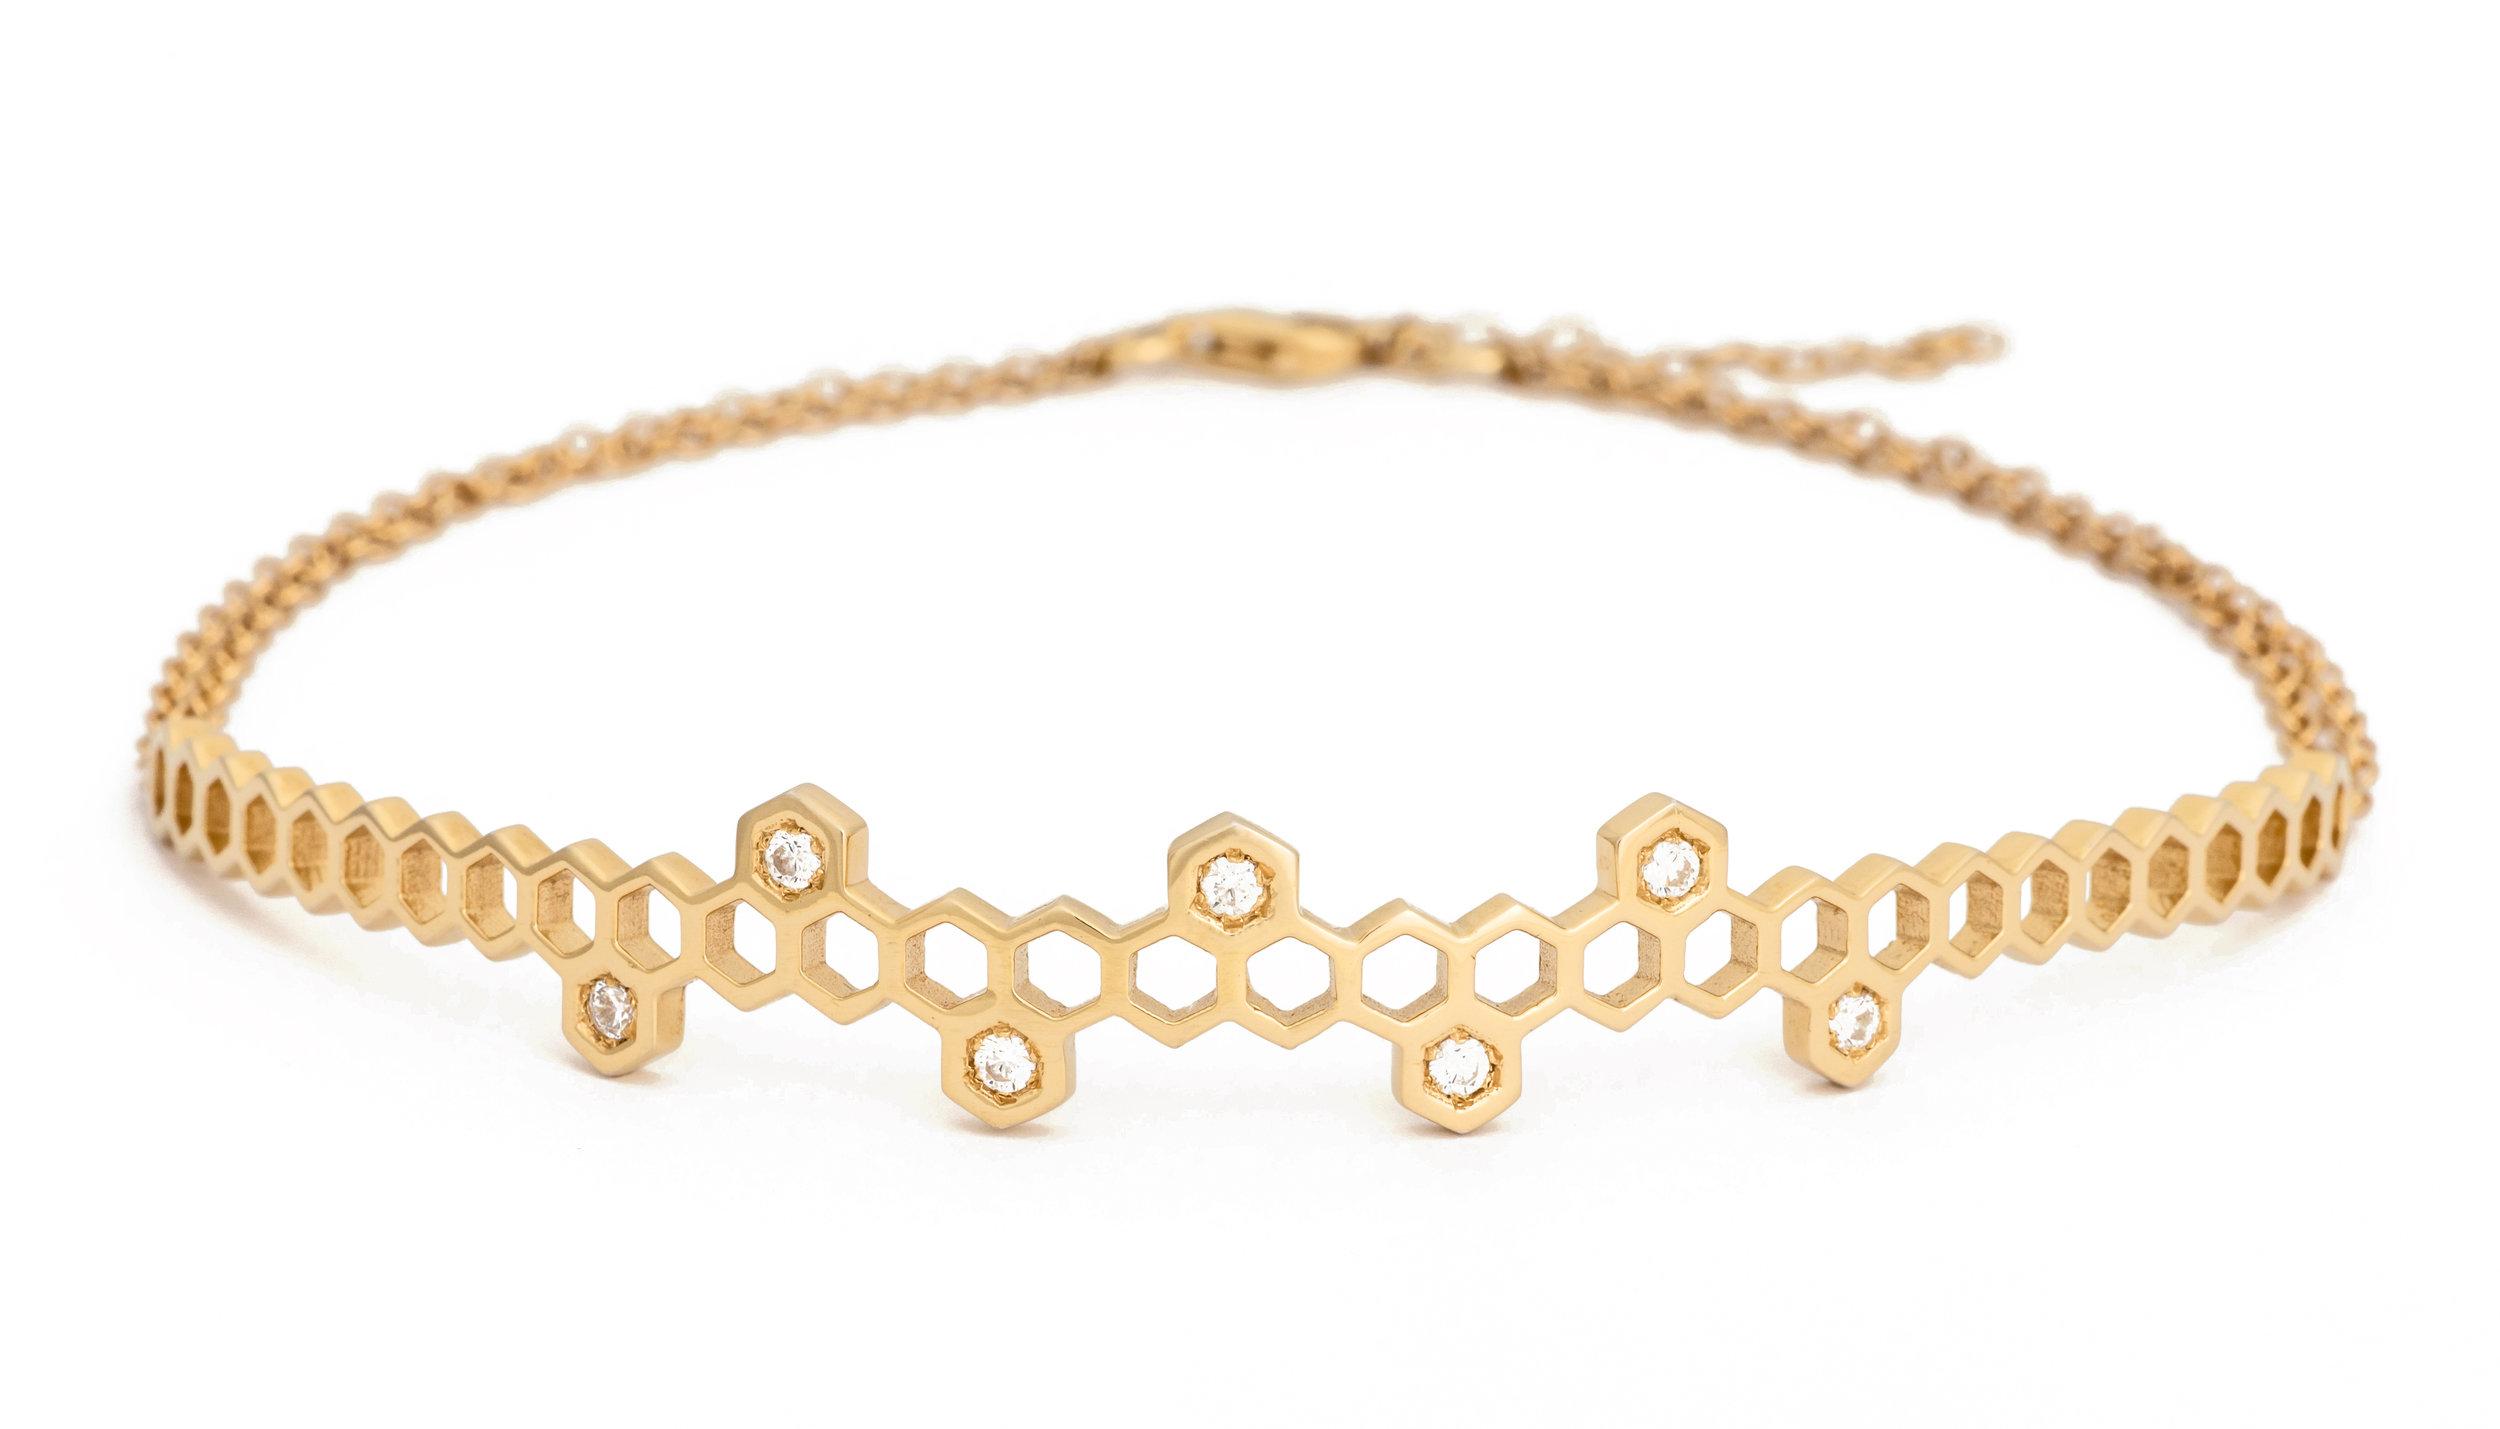 Honeycombs Crown Choker